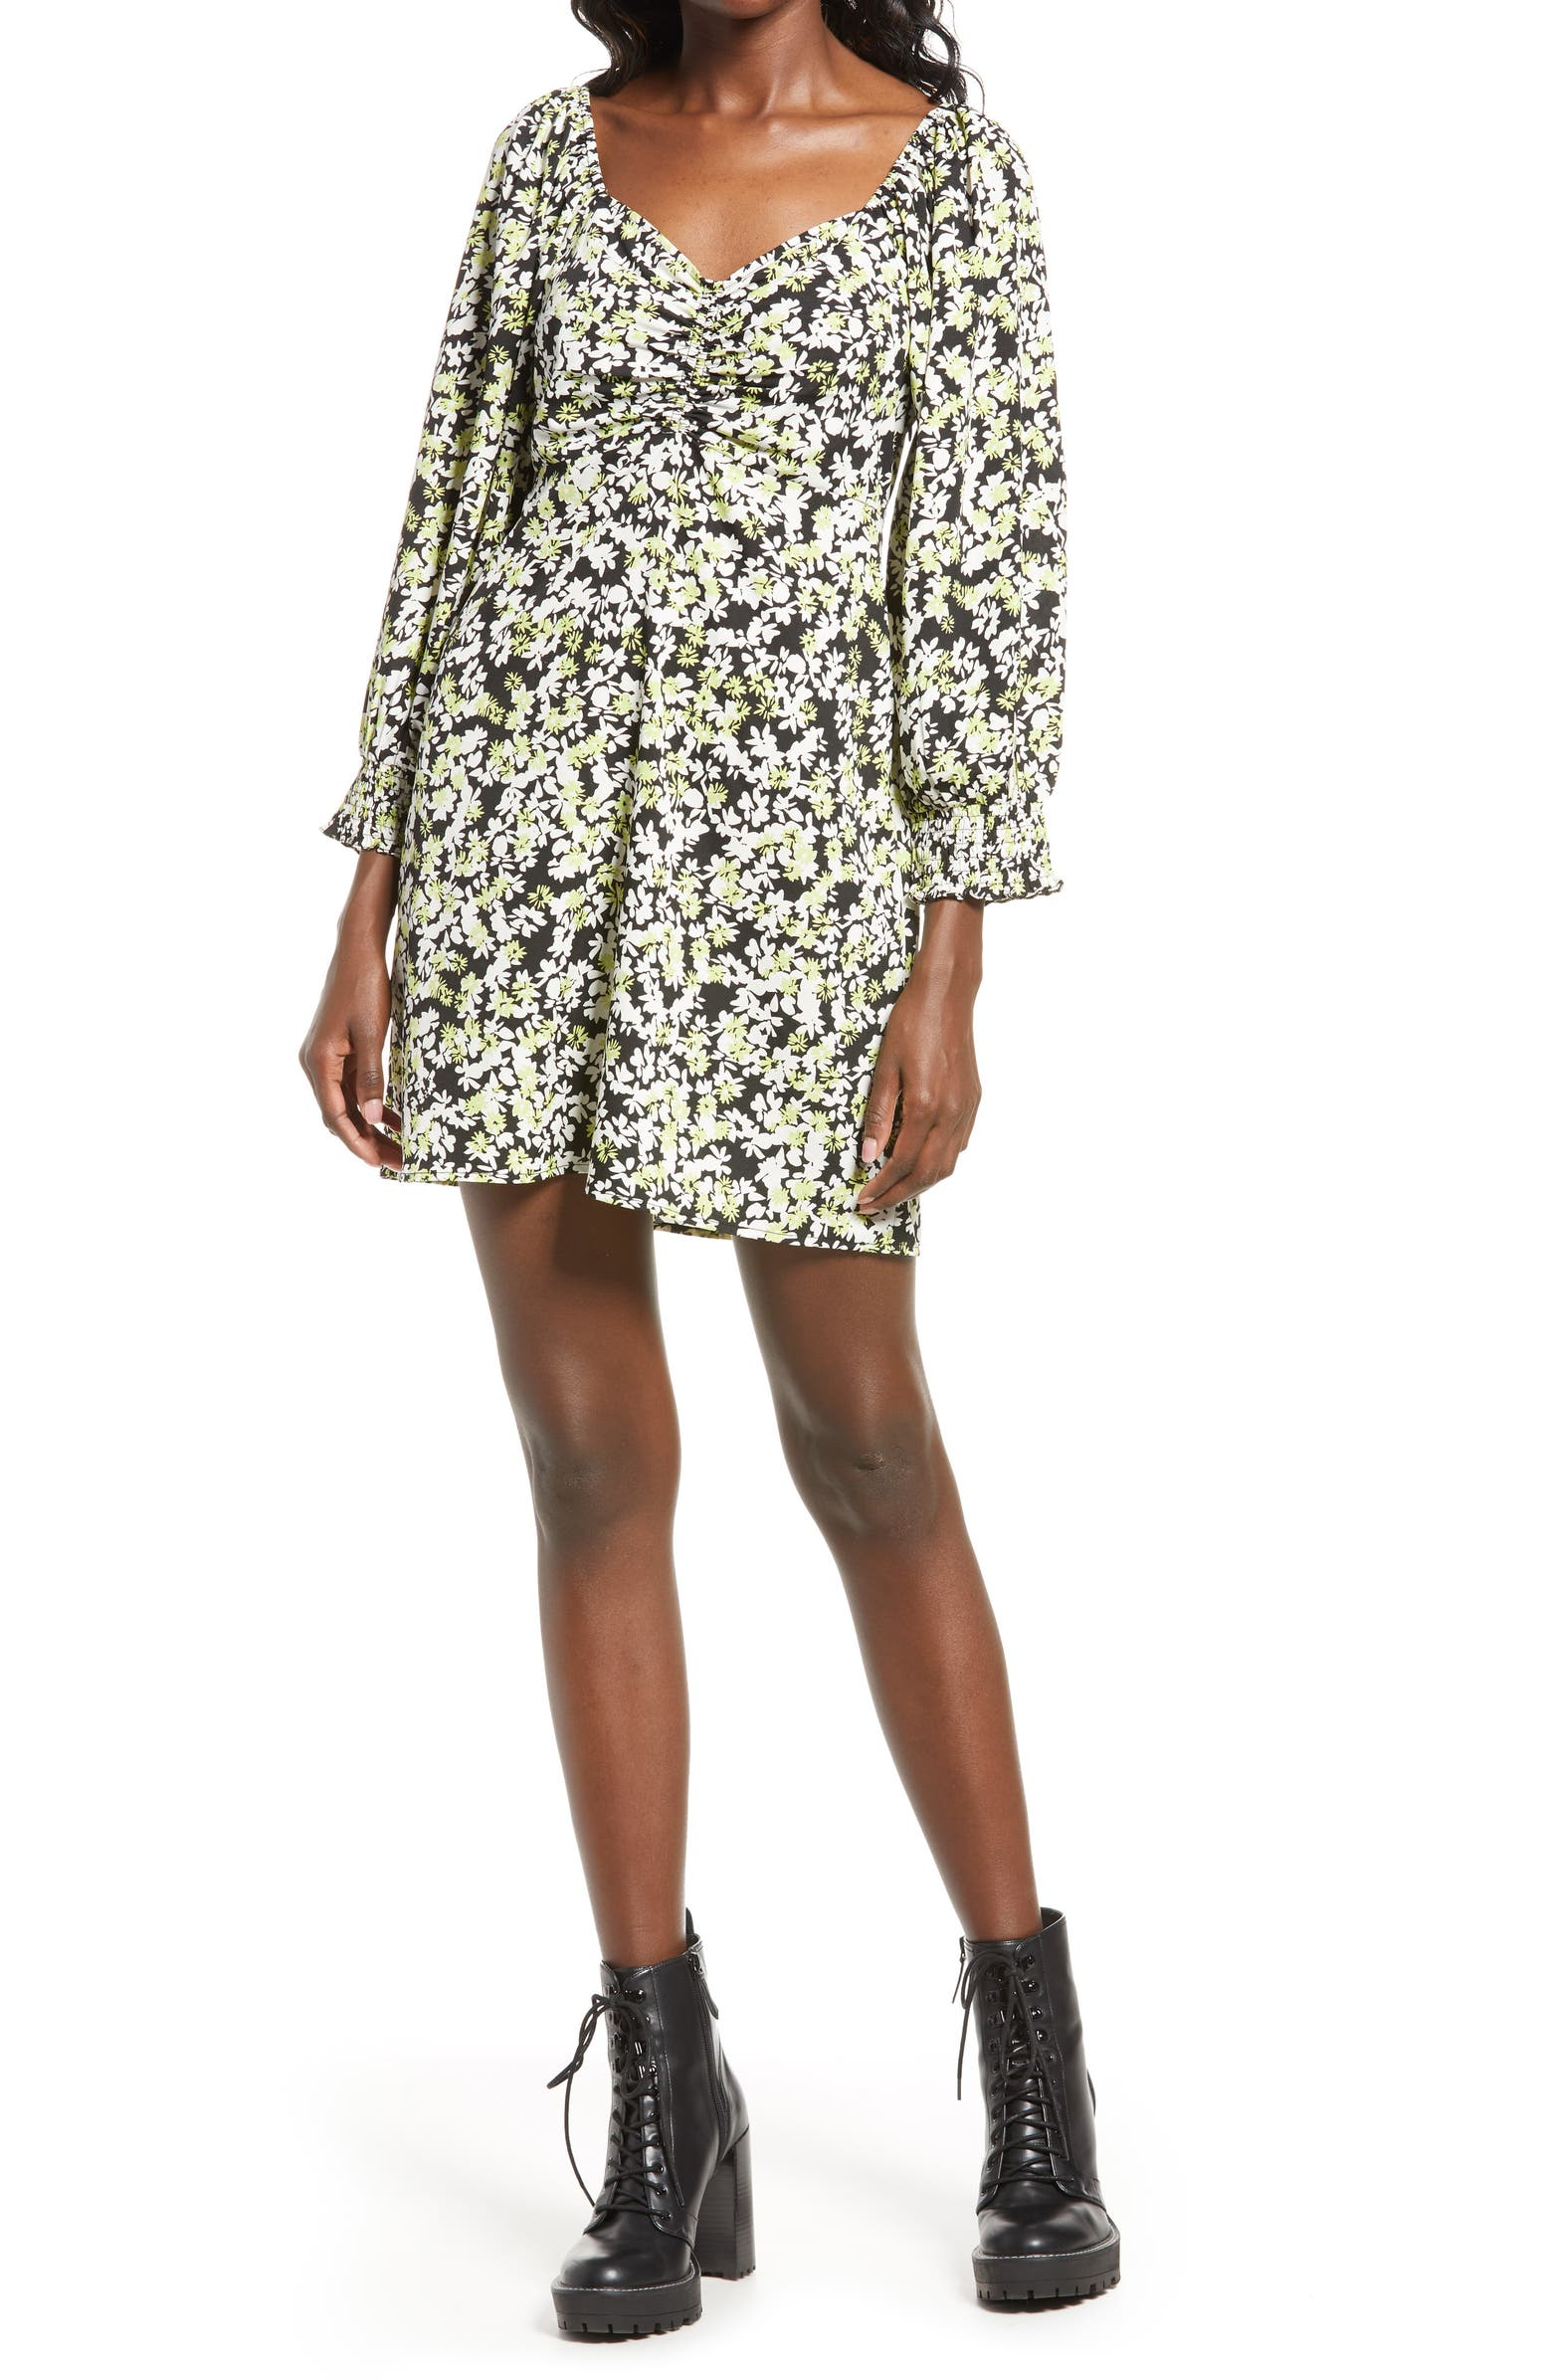 Vero Moda Chaddie Floral Long Sleeve Ruched Minidress